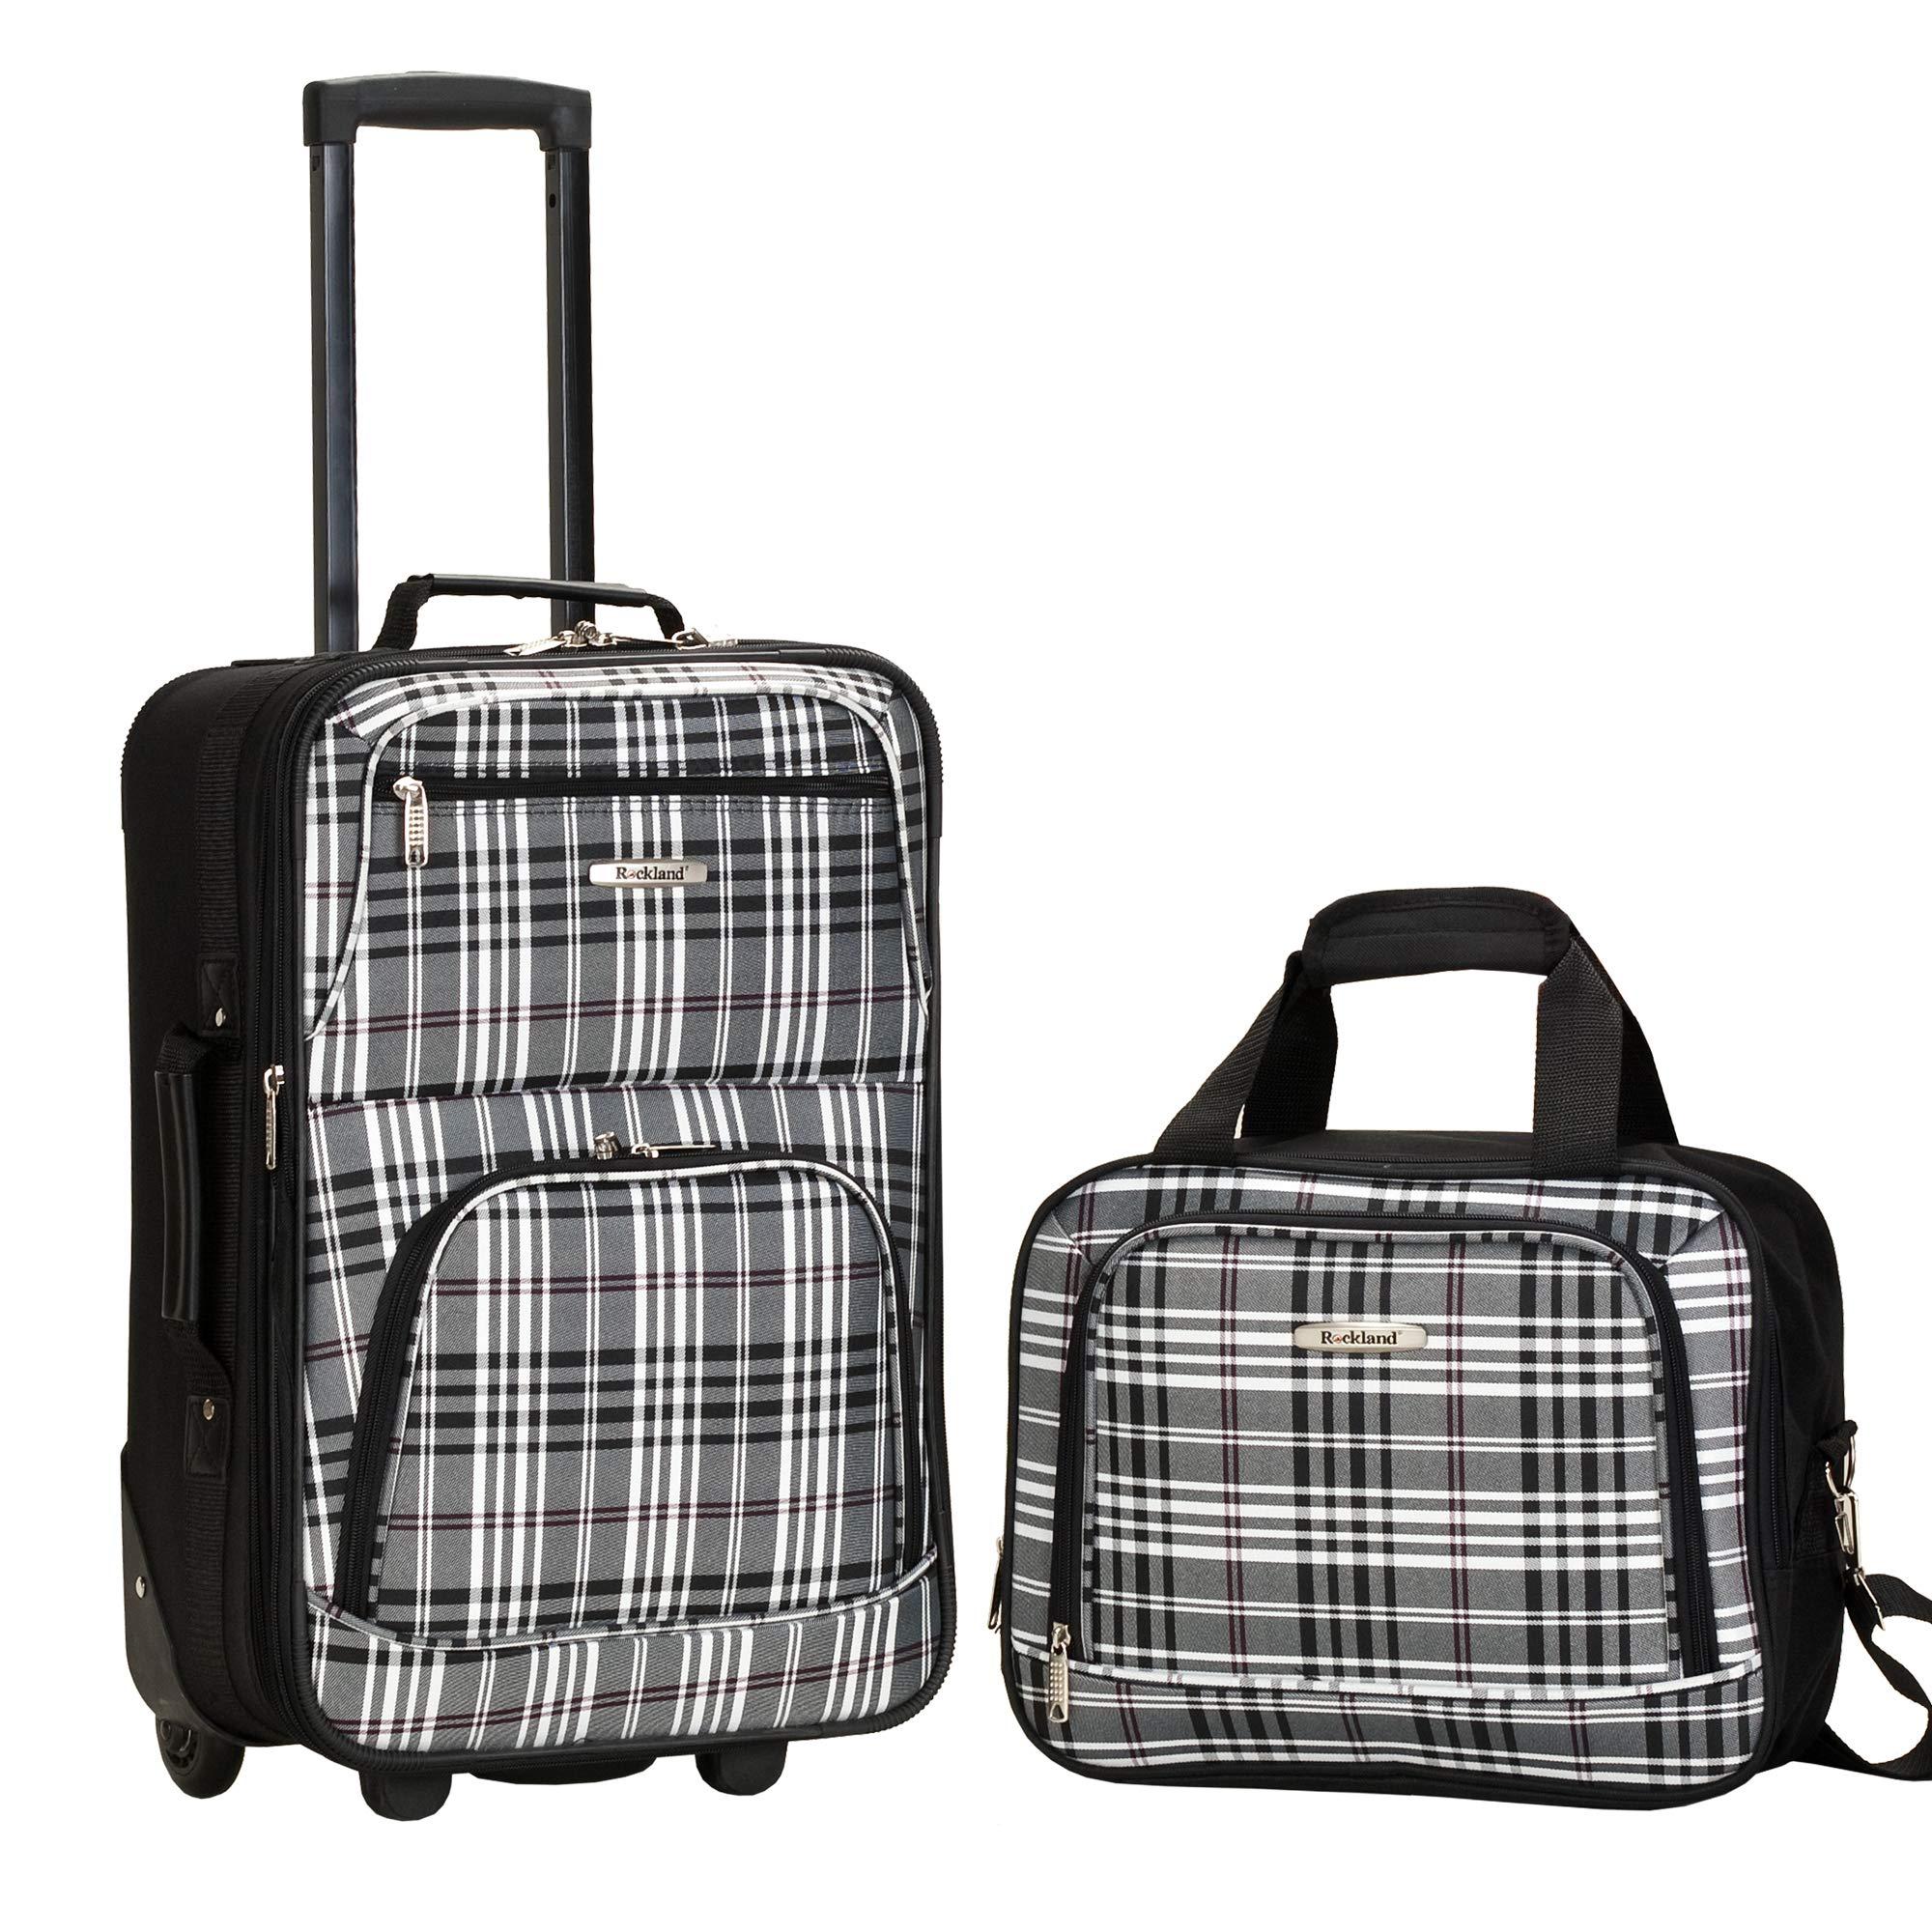 Rockland Luggage 2 Piece Printed Set, Blackcross, Medium